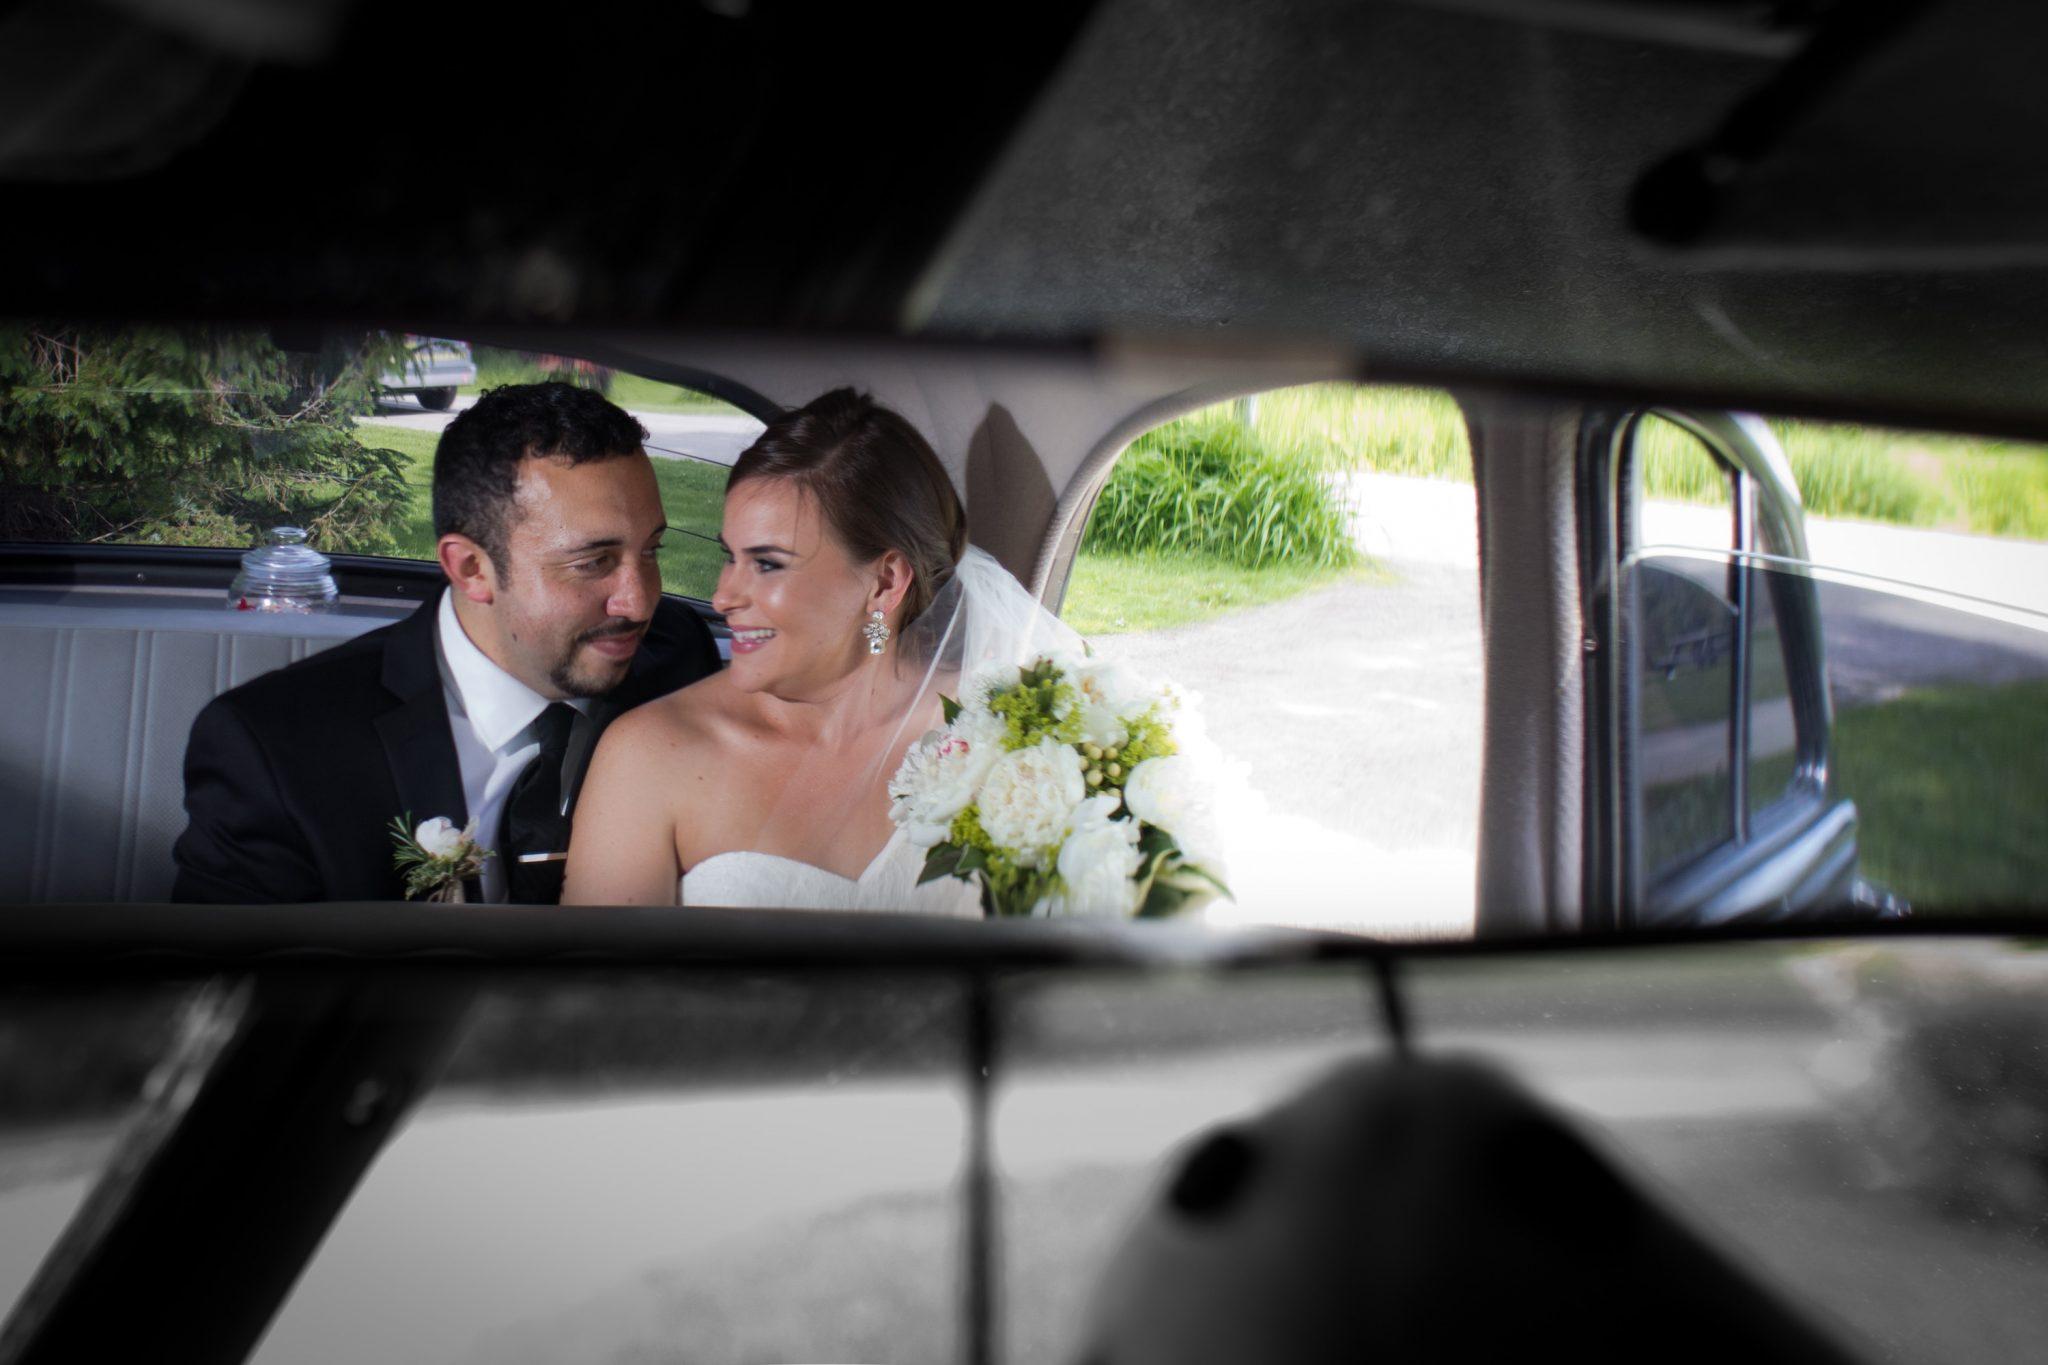 Vintage car mirror features wedding couple portrait in vermont